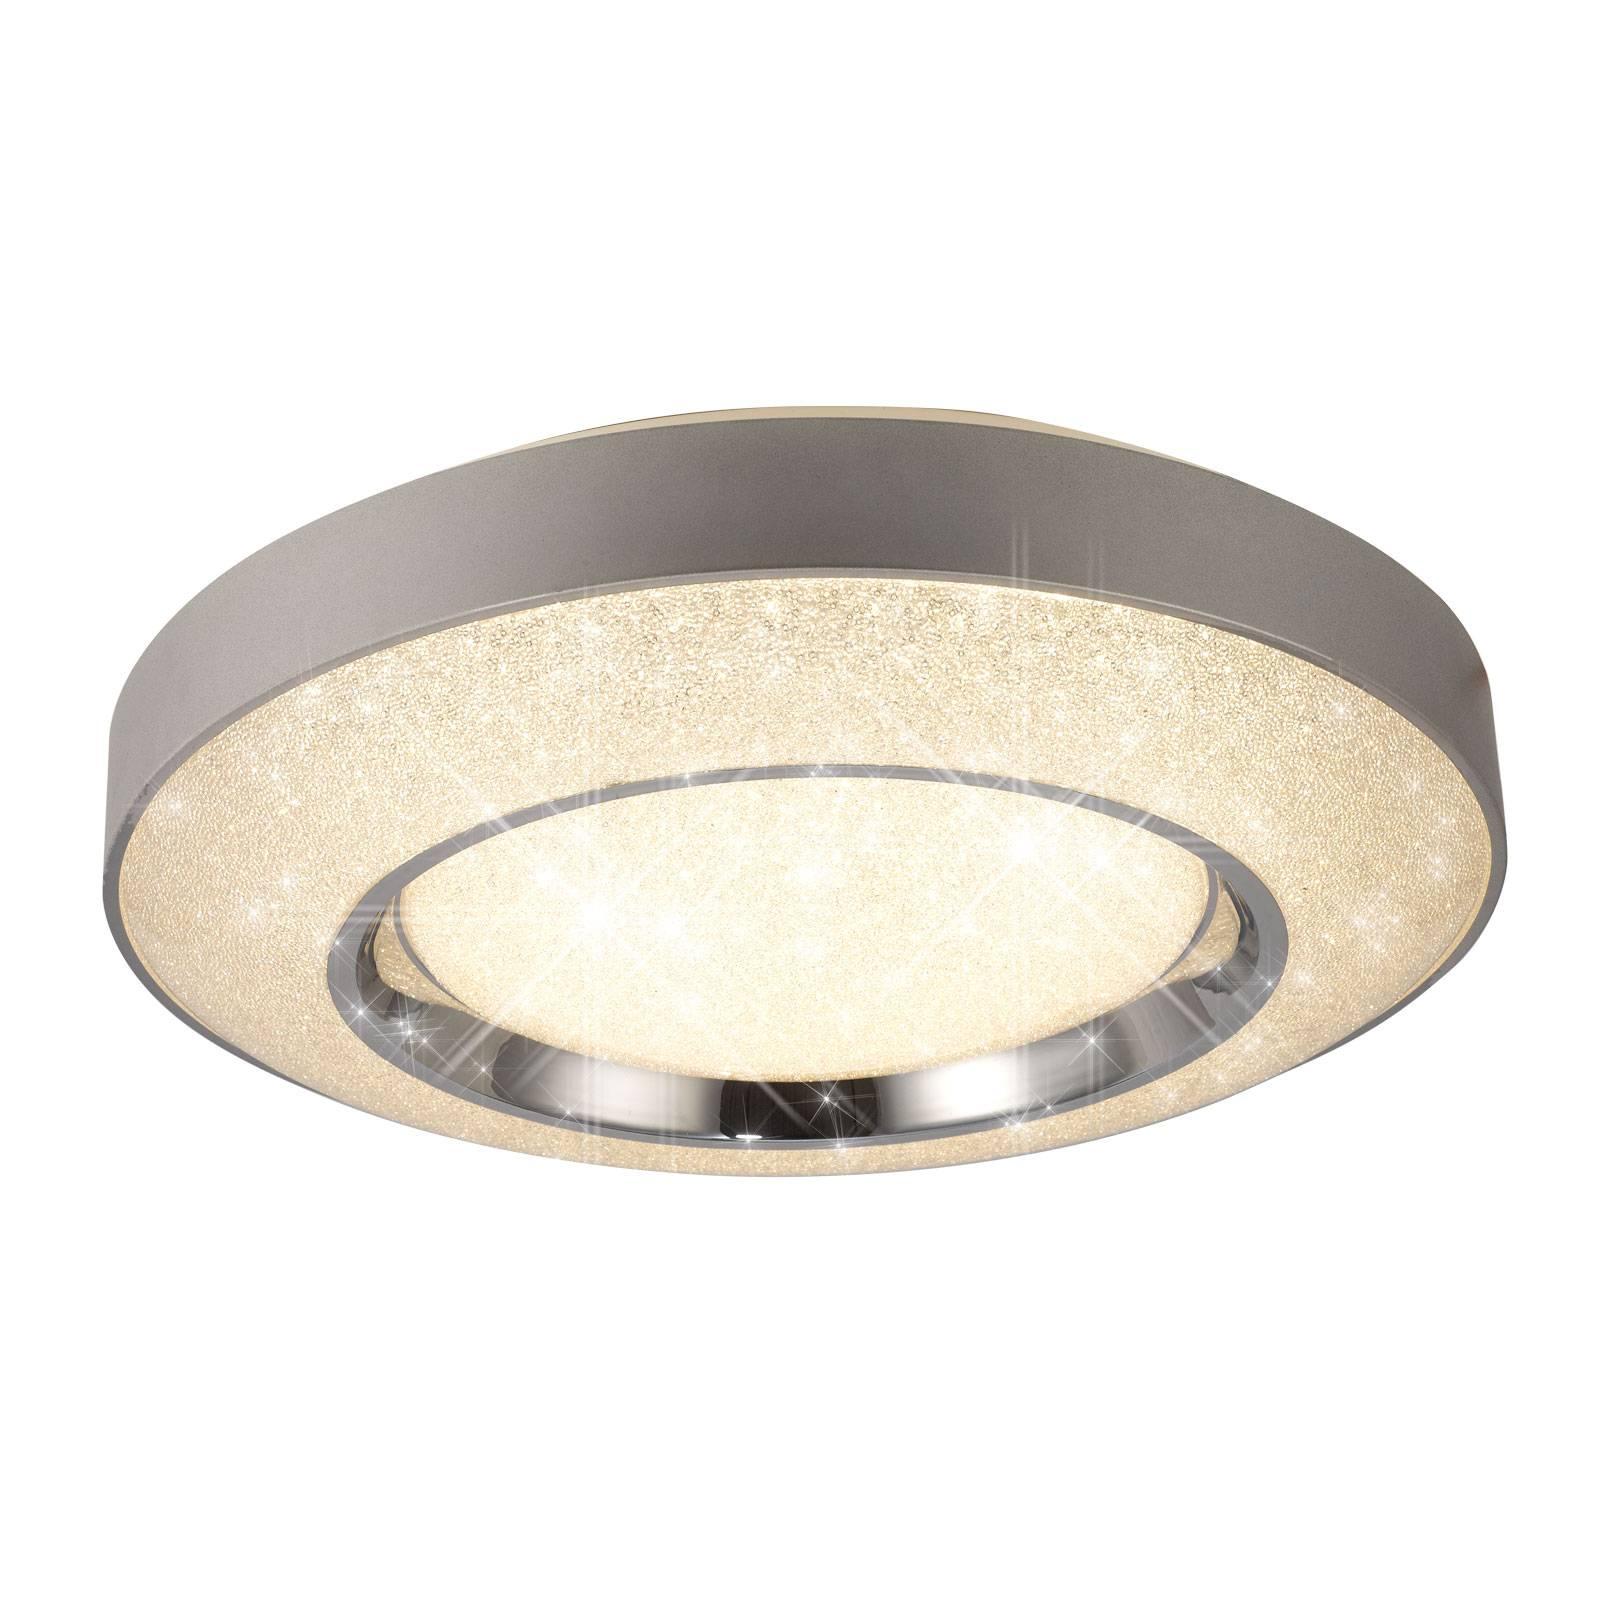 LED plafondlamp Santorini afstandsbediening Ø52 cm